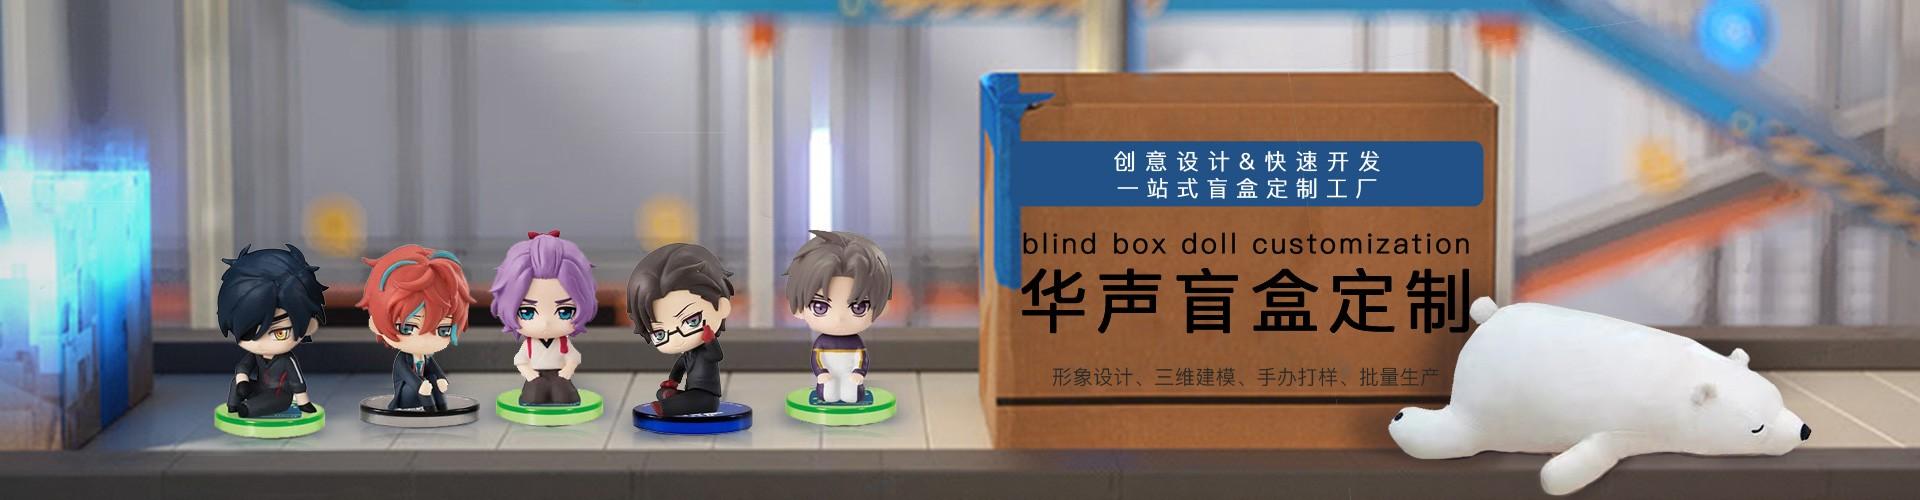 86fashion 上海华声 盲盒